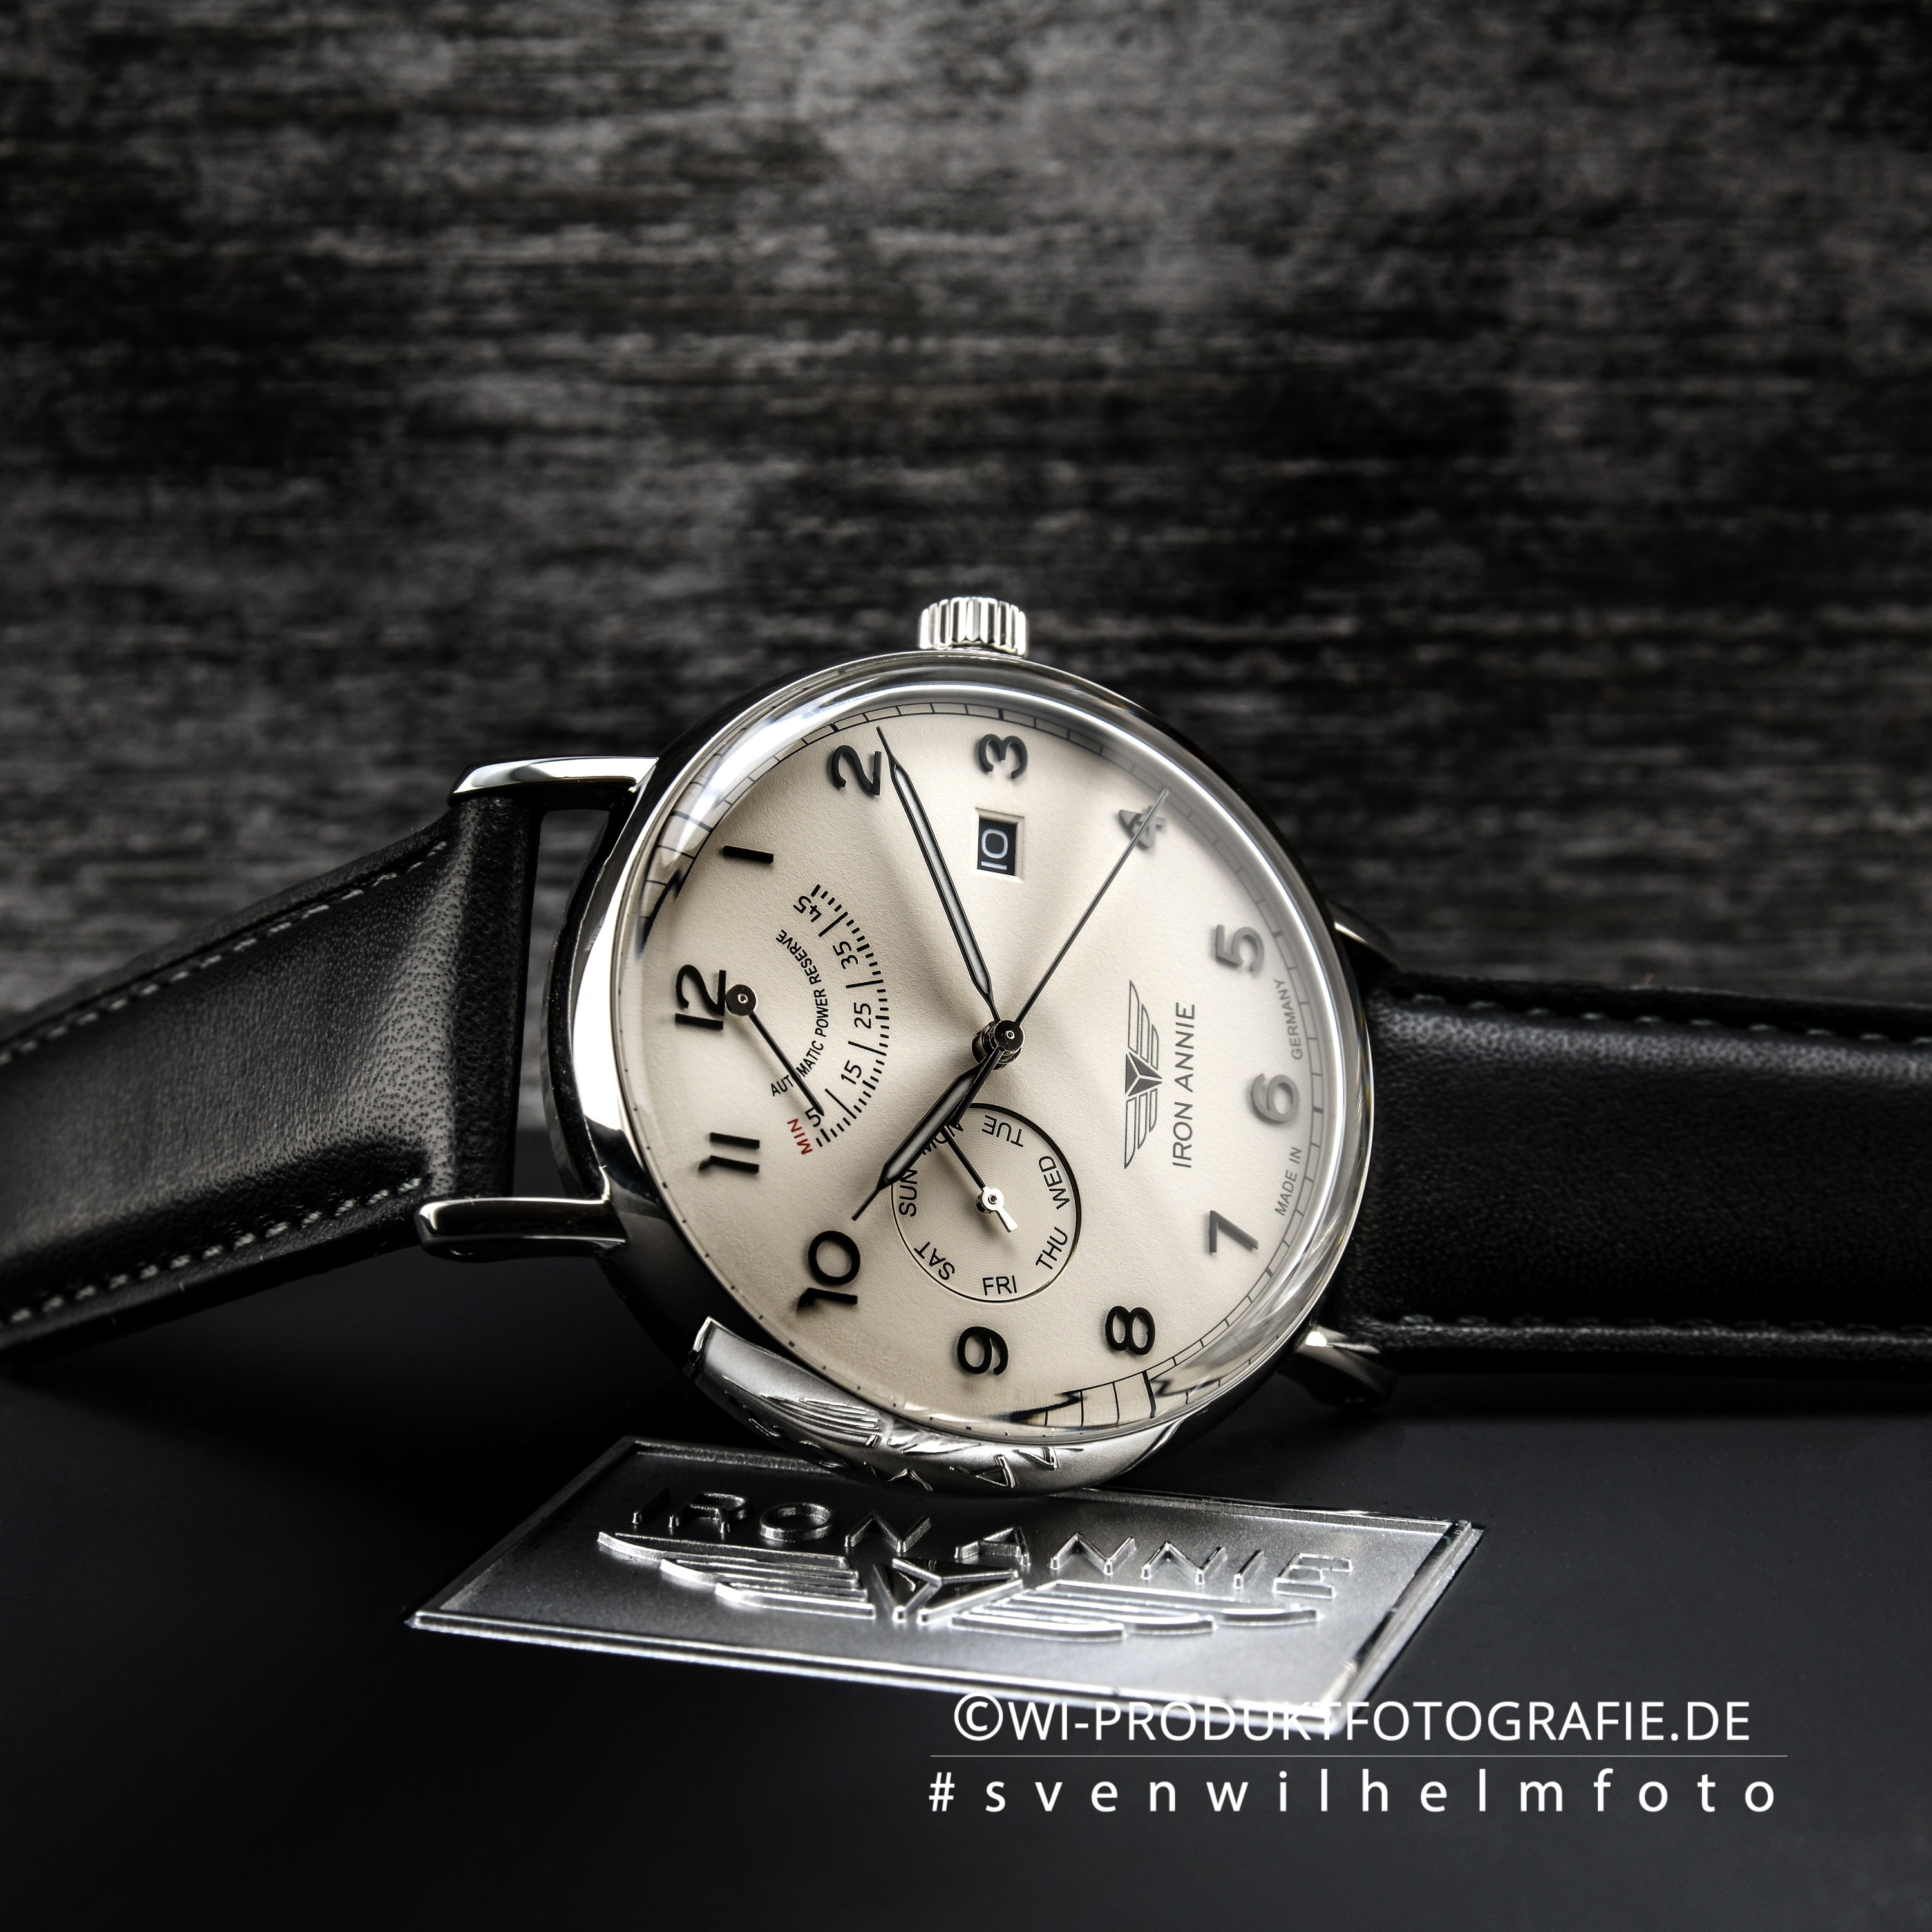 Uhrenfotograf Iron Annie 5960-5 Uhrenfotografie Profi Spezialist Chrom Gold Edelstahl